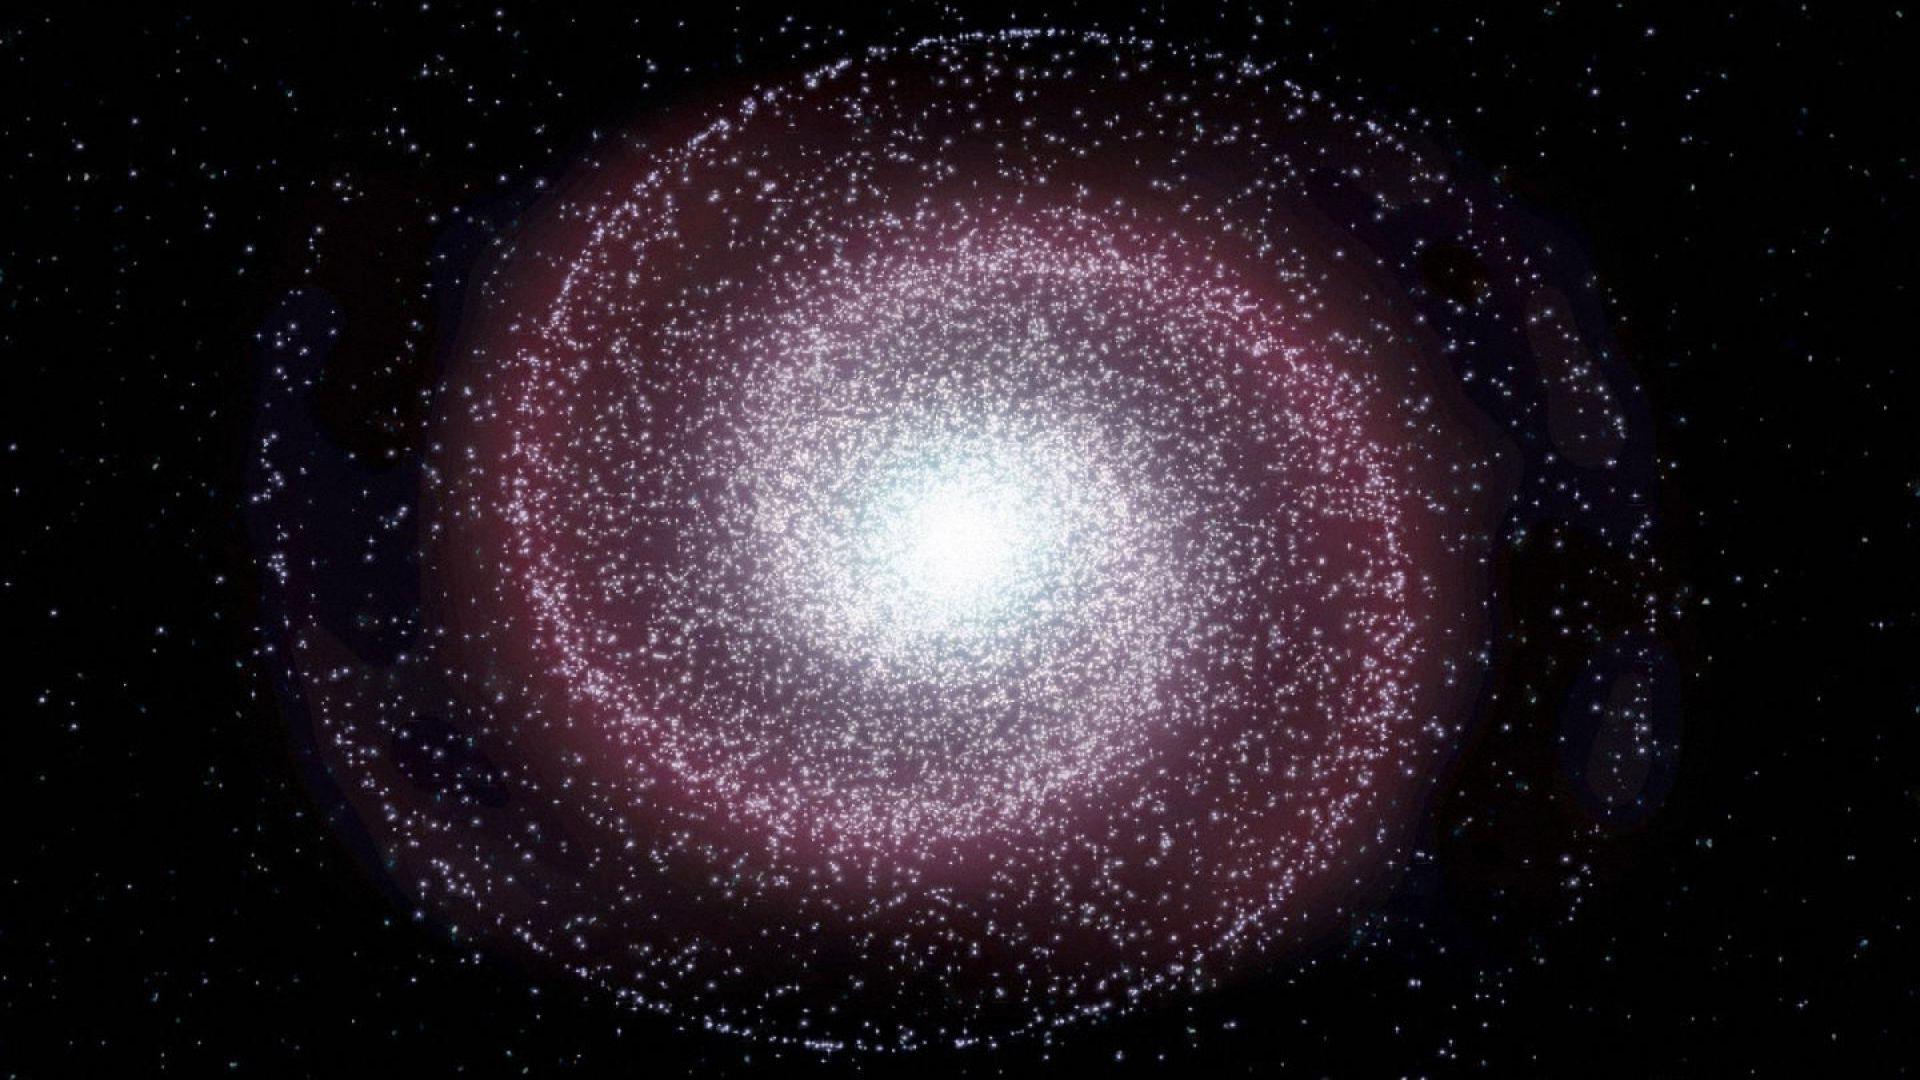 Spiral galaxy wallpaper 7427 1920x1080